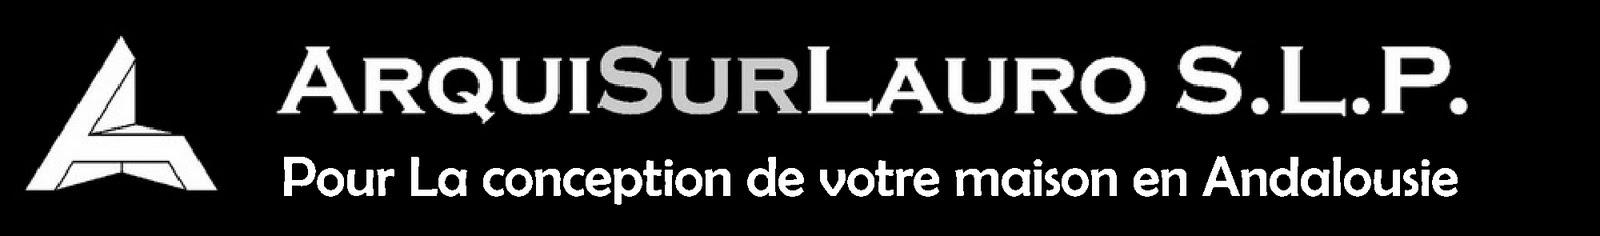 Arquisurlauro en Français